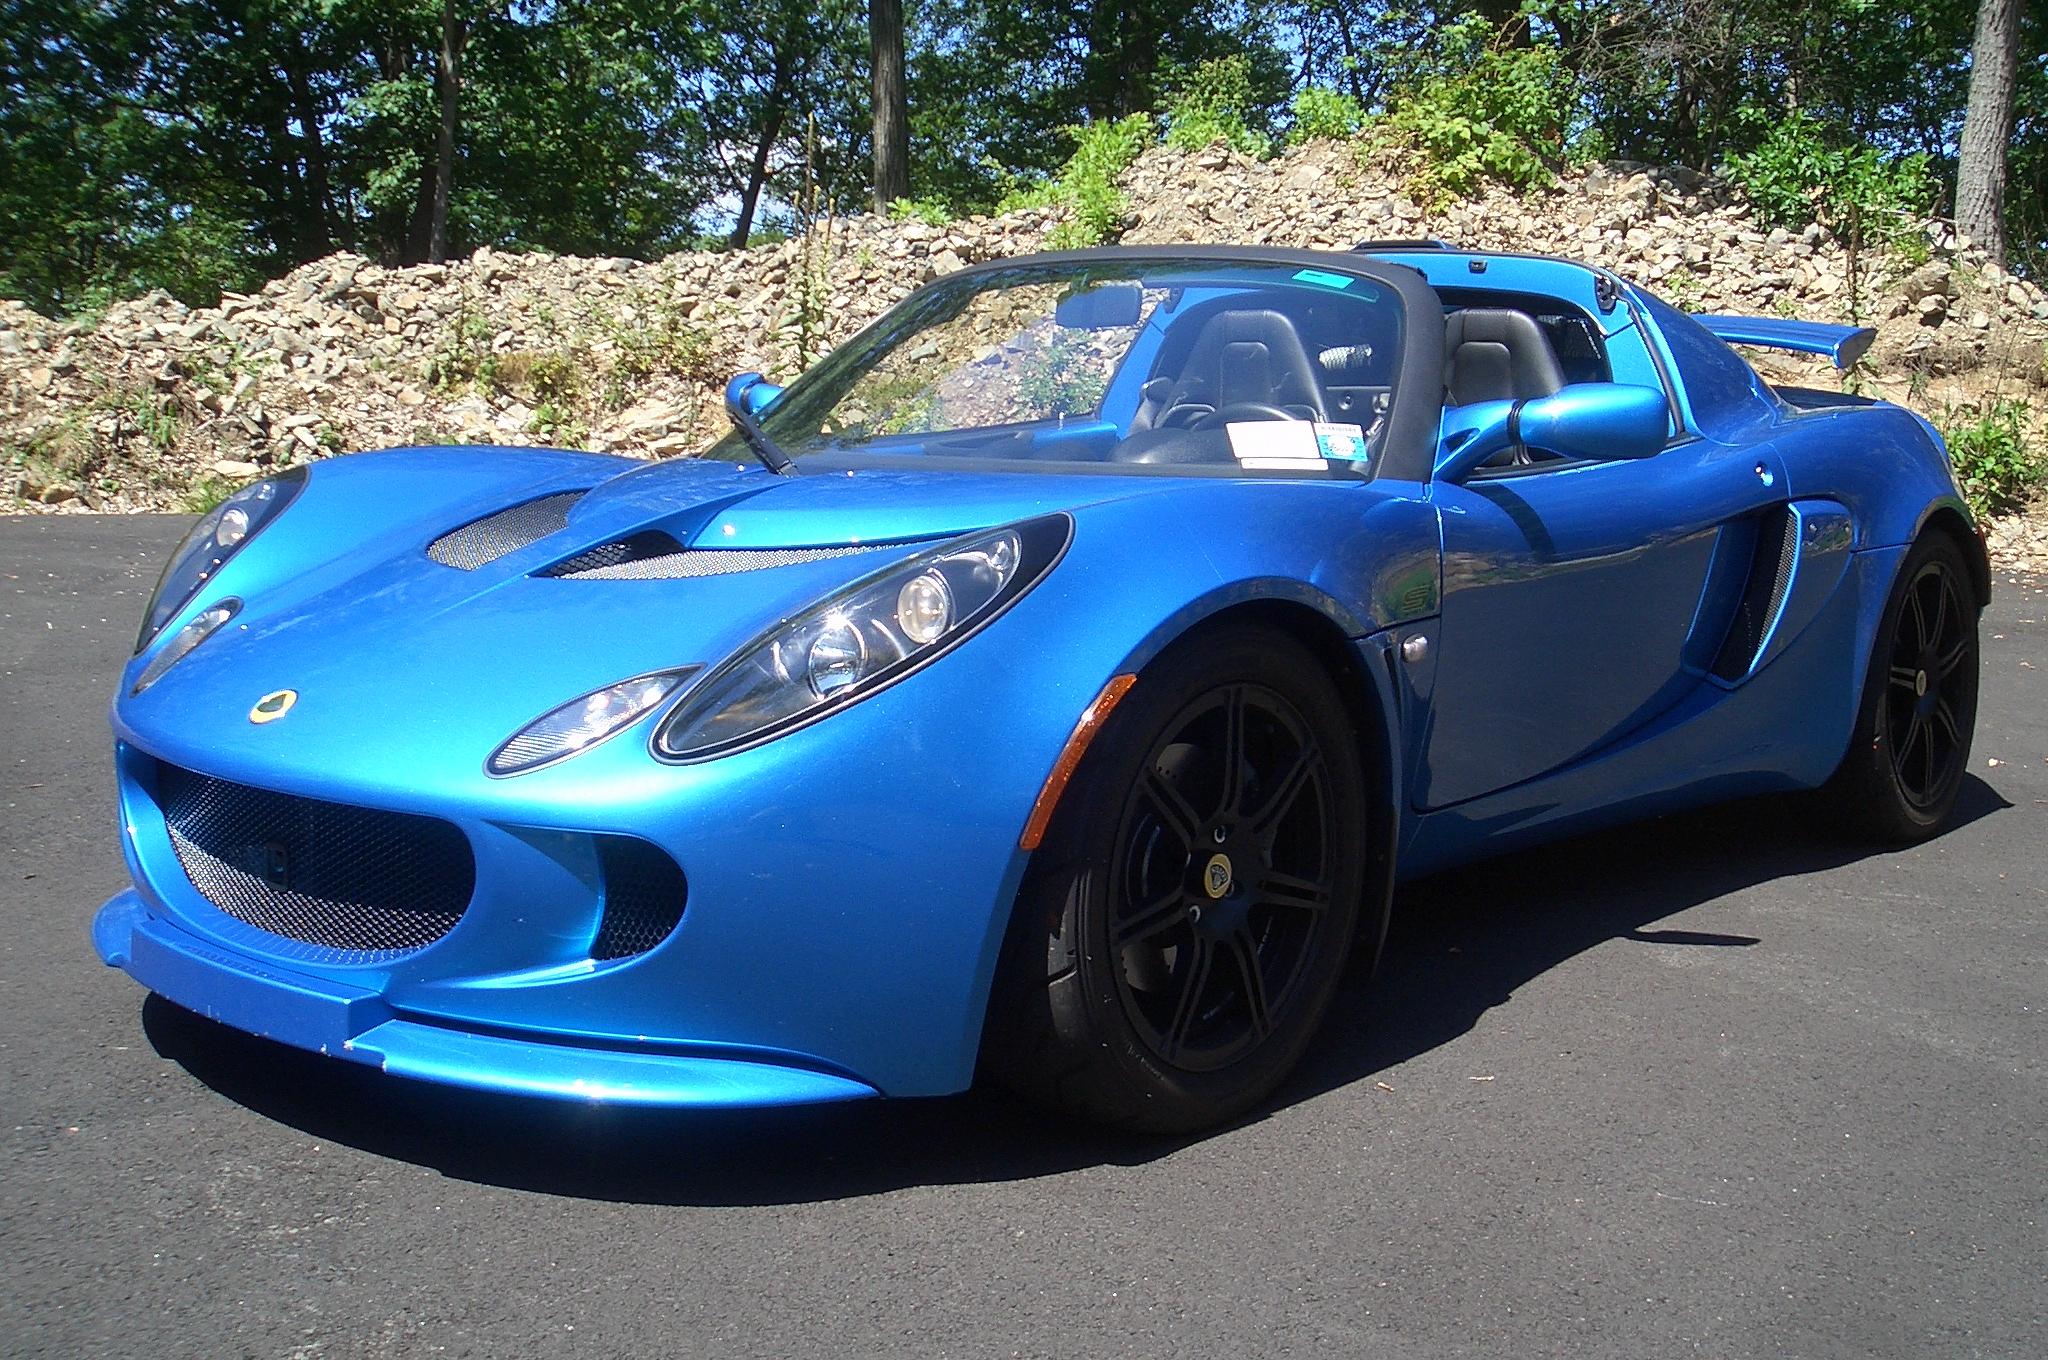 2007-lotus-exige-10 Mesmerizing Lotus Carlton for Sale 2015 Cars Trend